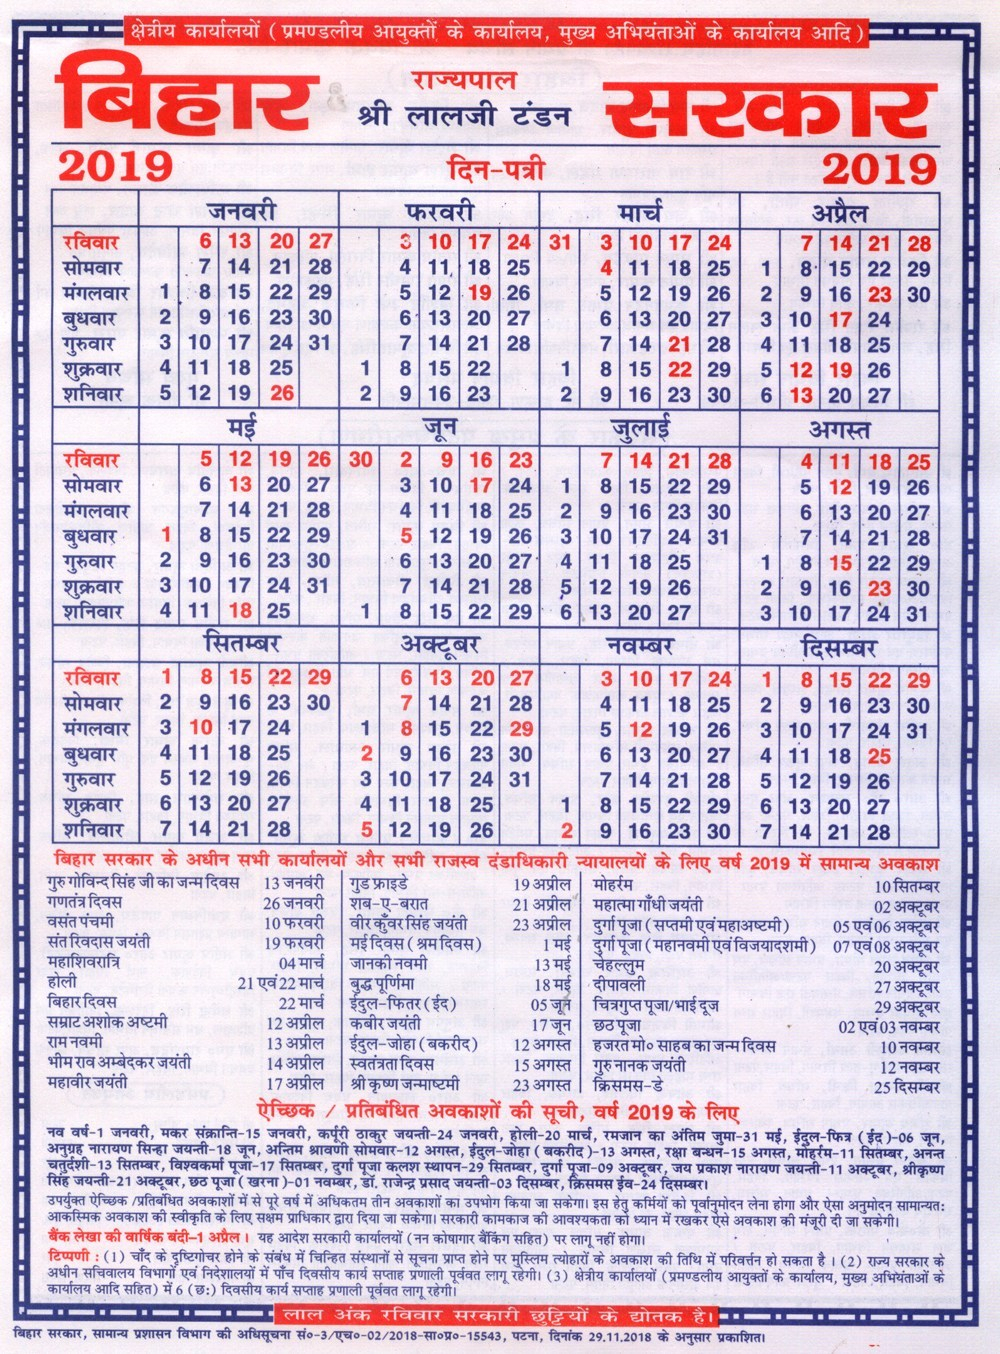 Bihar_Government_Calendar2019 | Bihar School in Bihar Govt. Calendar 2020